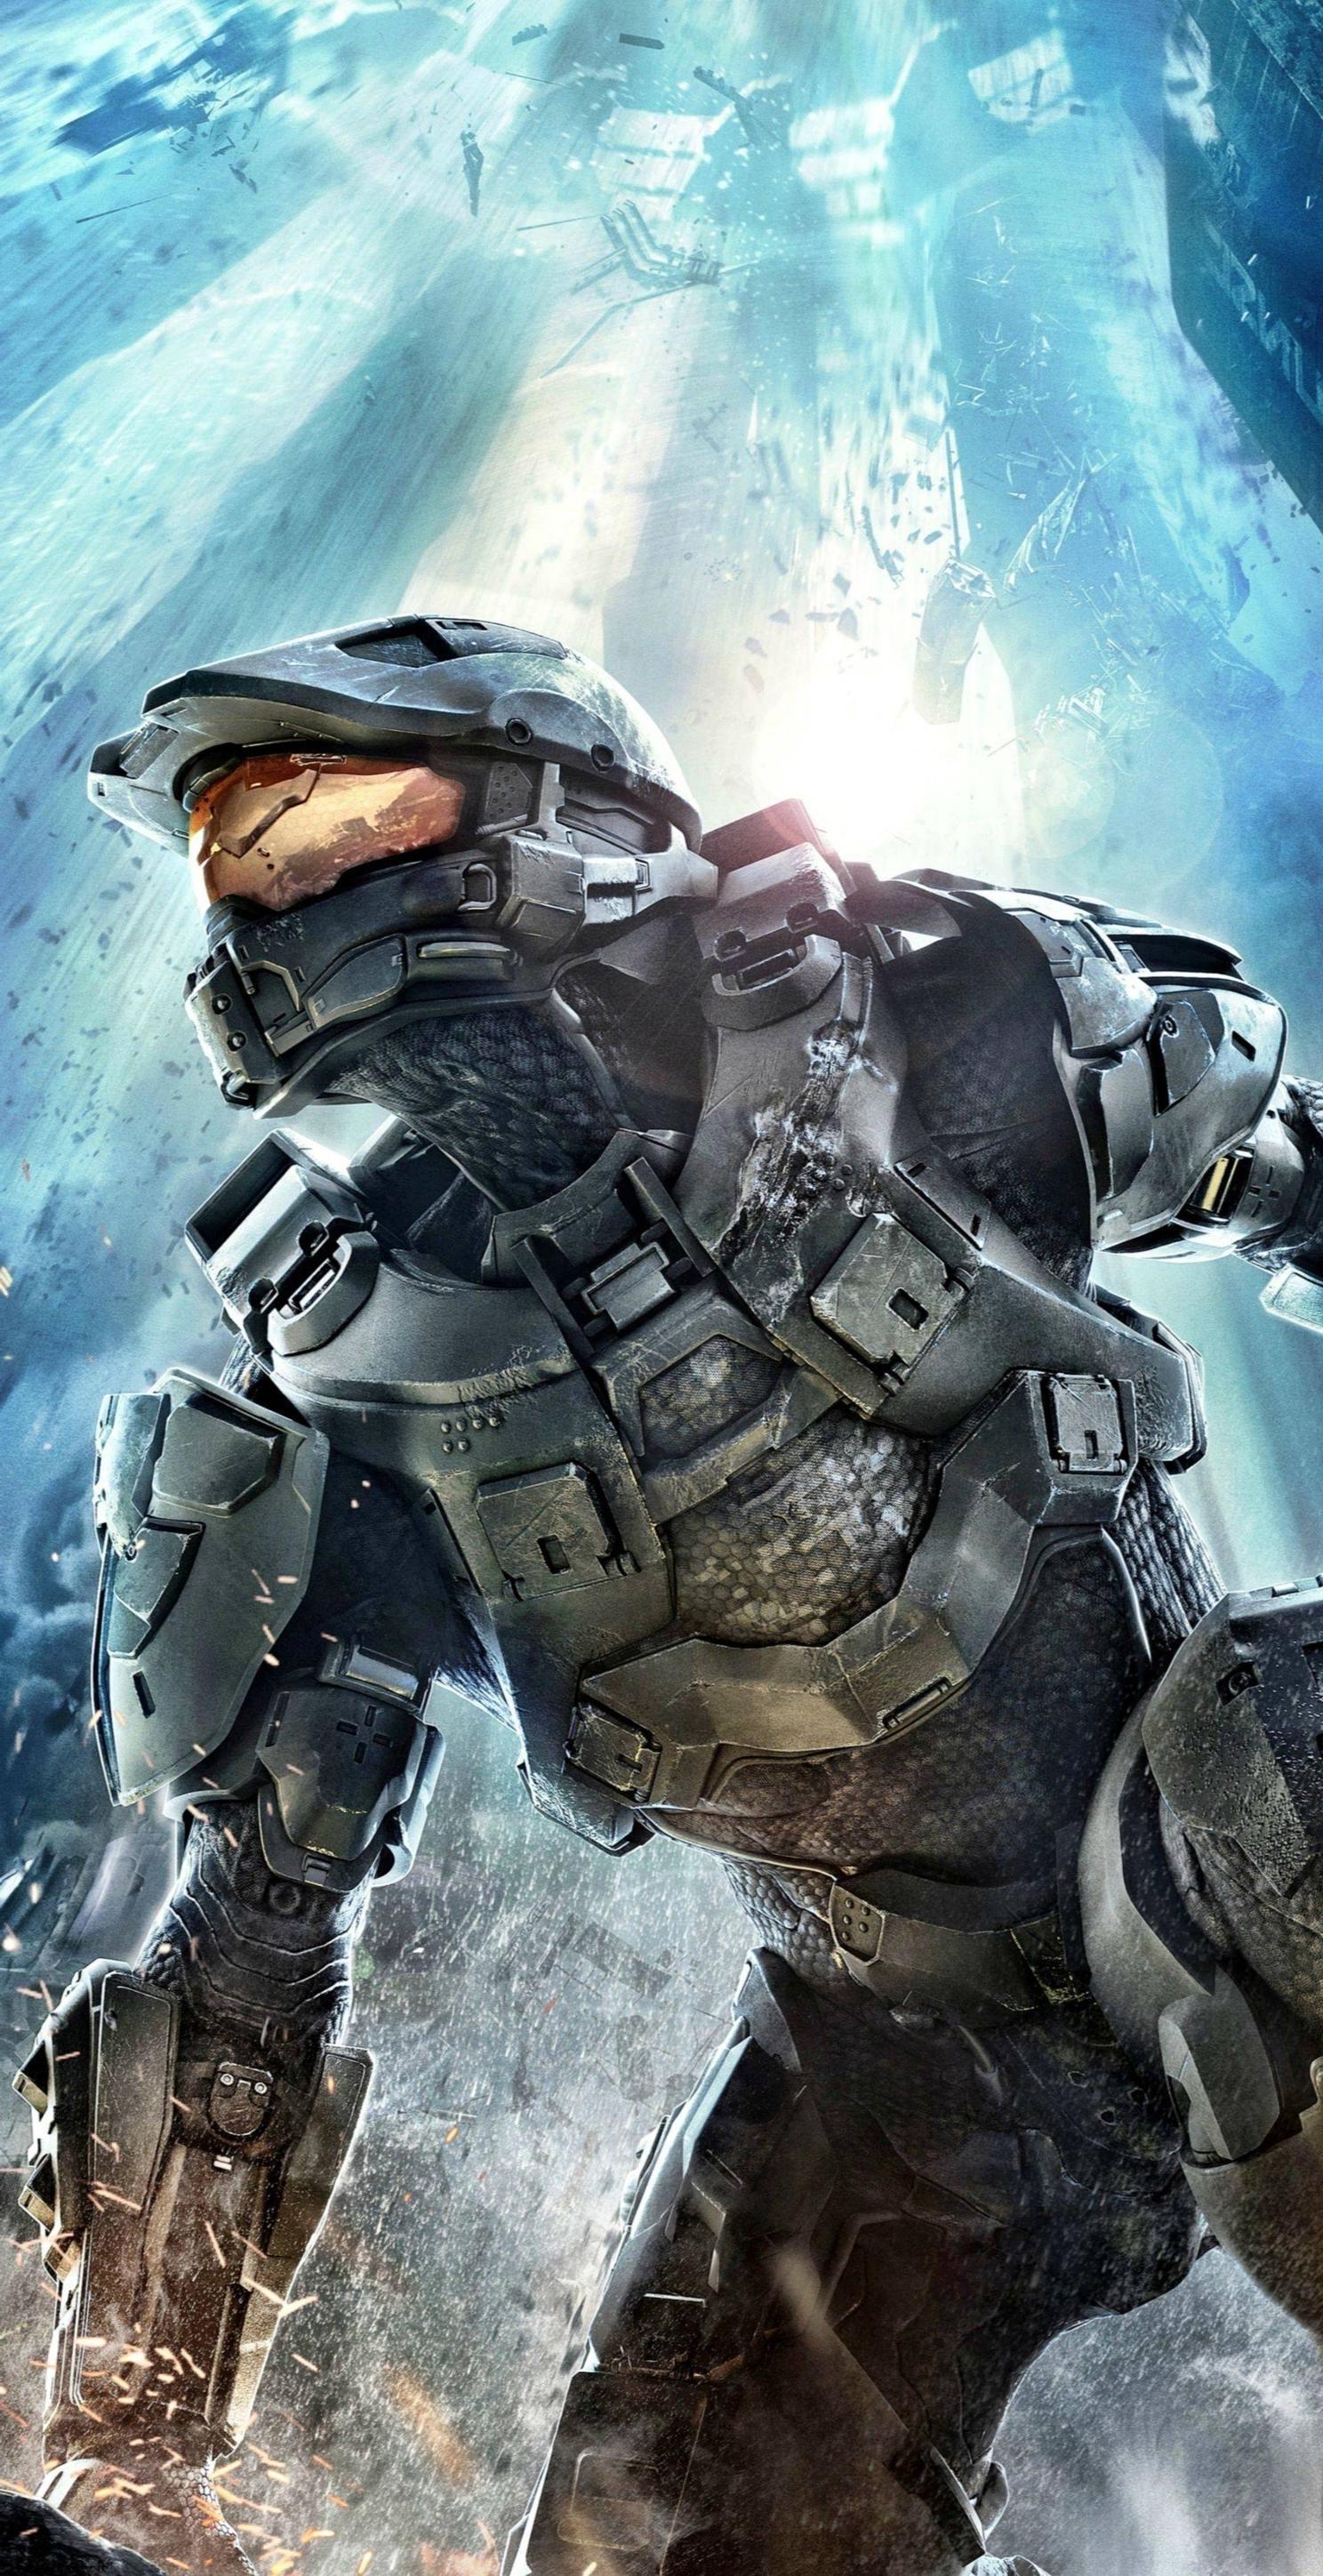 1488x2897 Halo Iphone Backgrounds Halo Reach Xbox One Futurizm